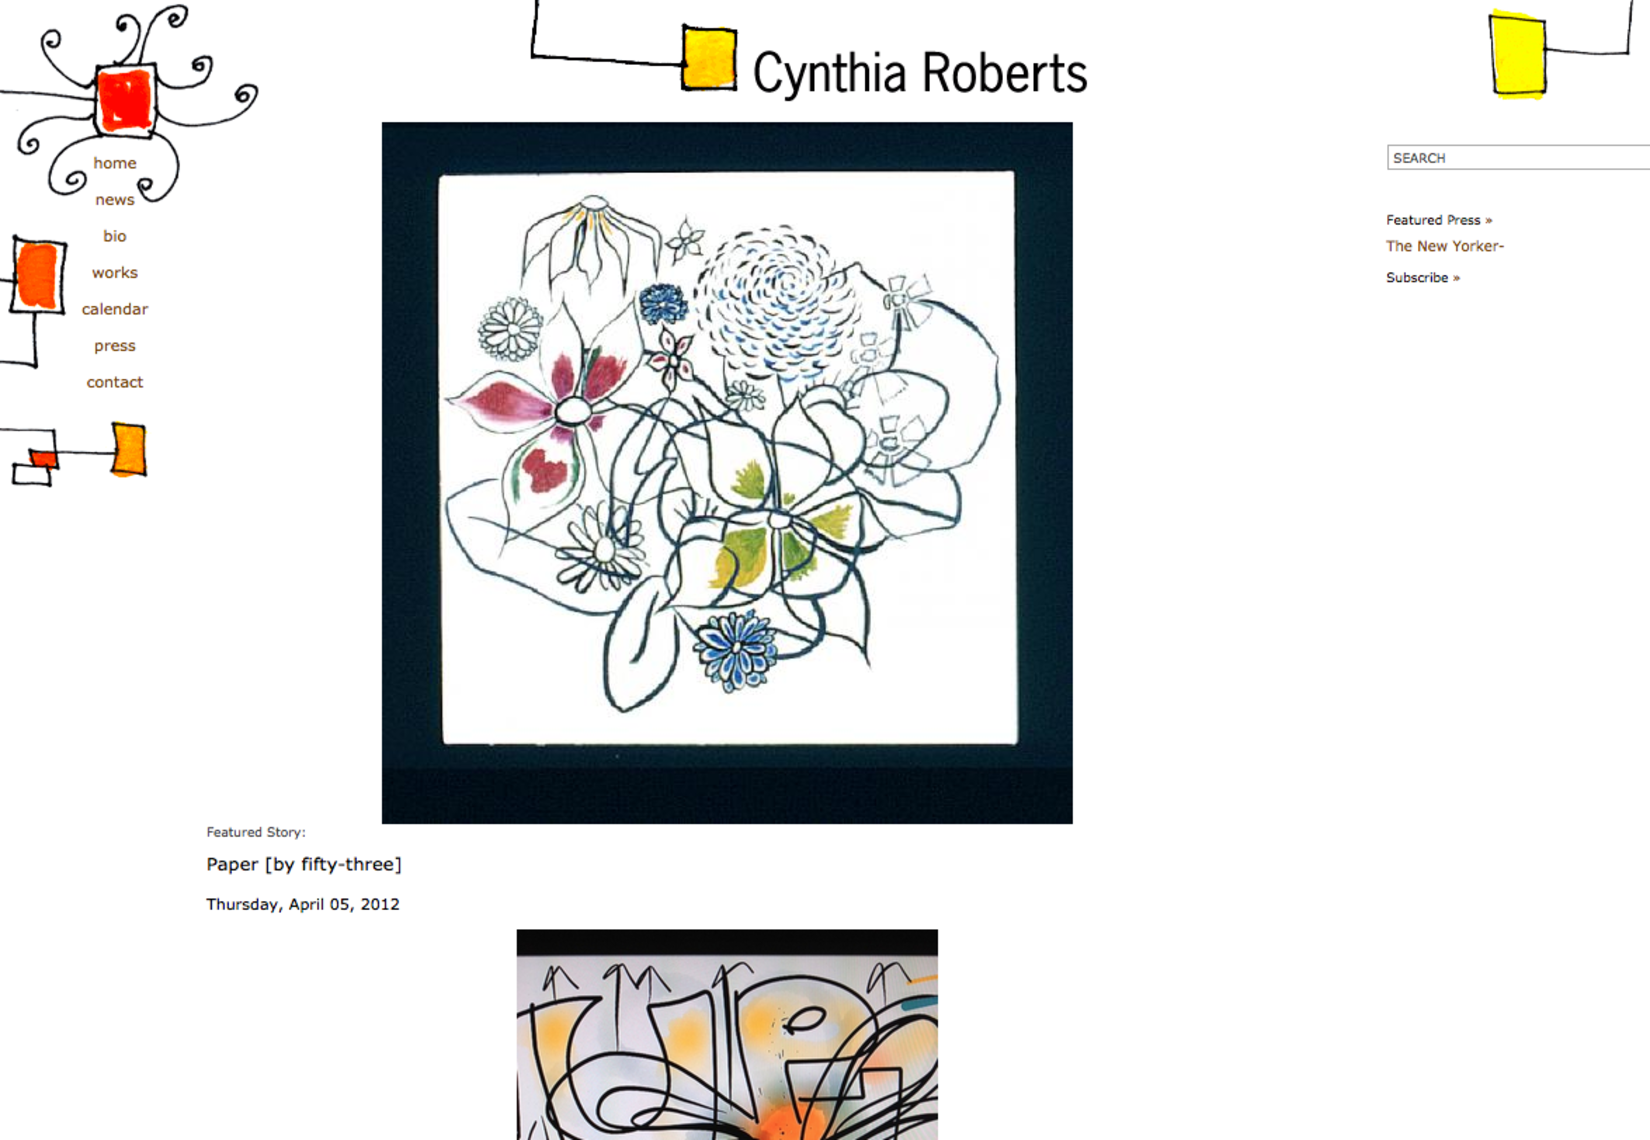 Cynthia Roberts, Visual Artist